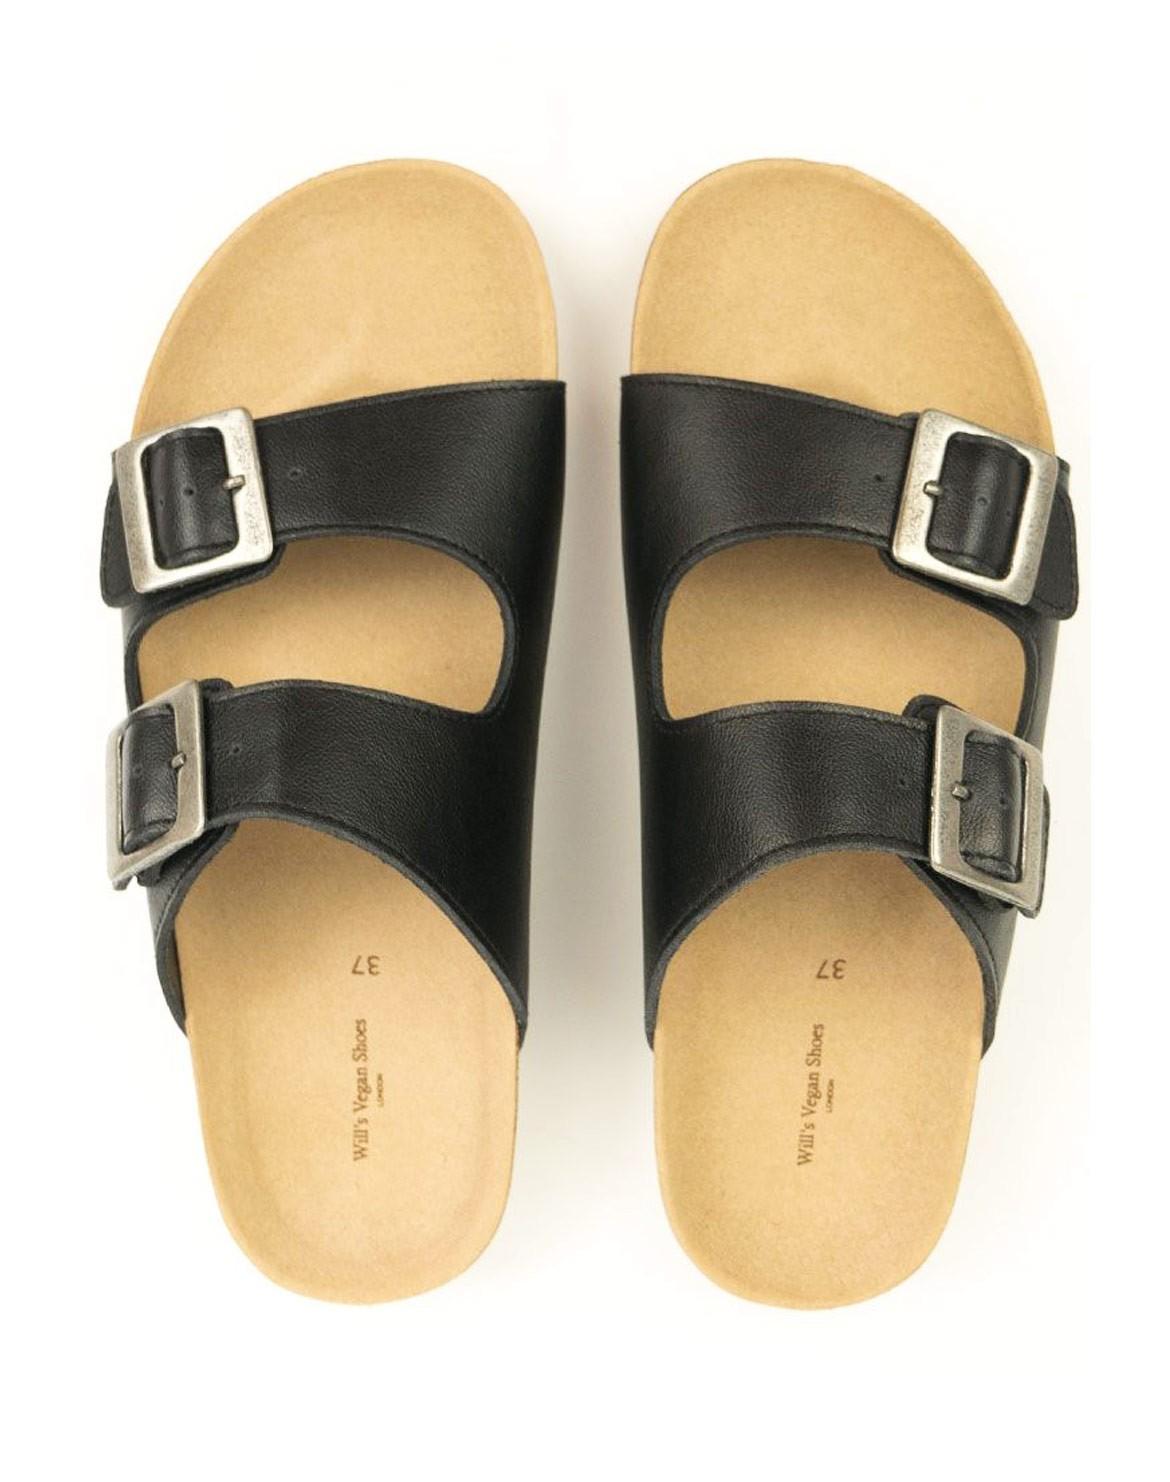 Two Strap Footbed Sandalen